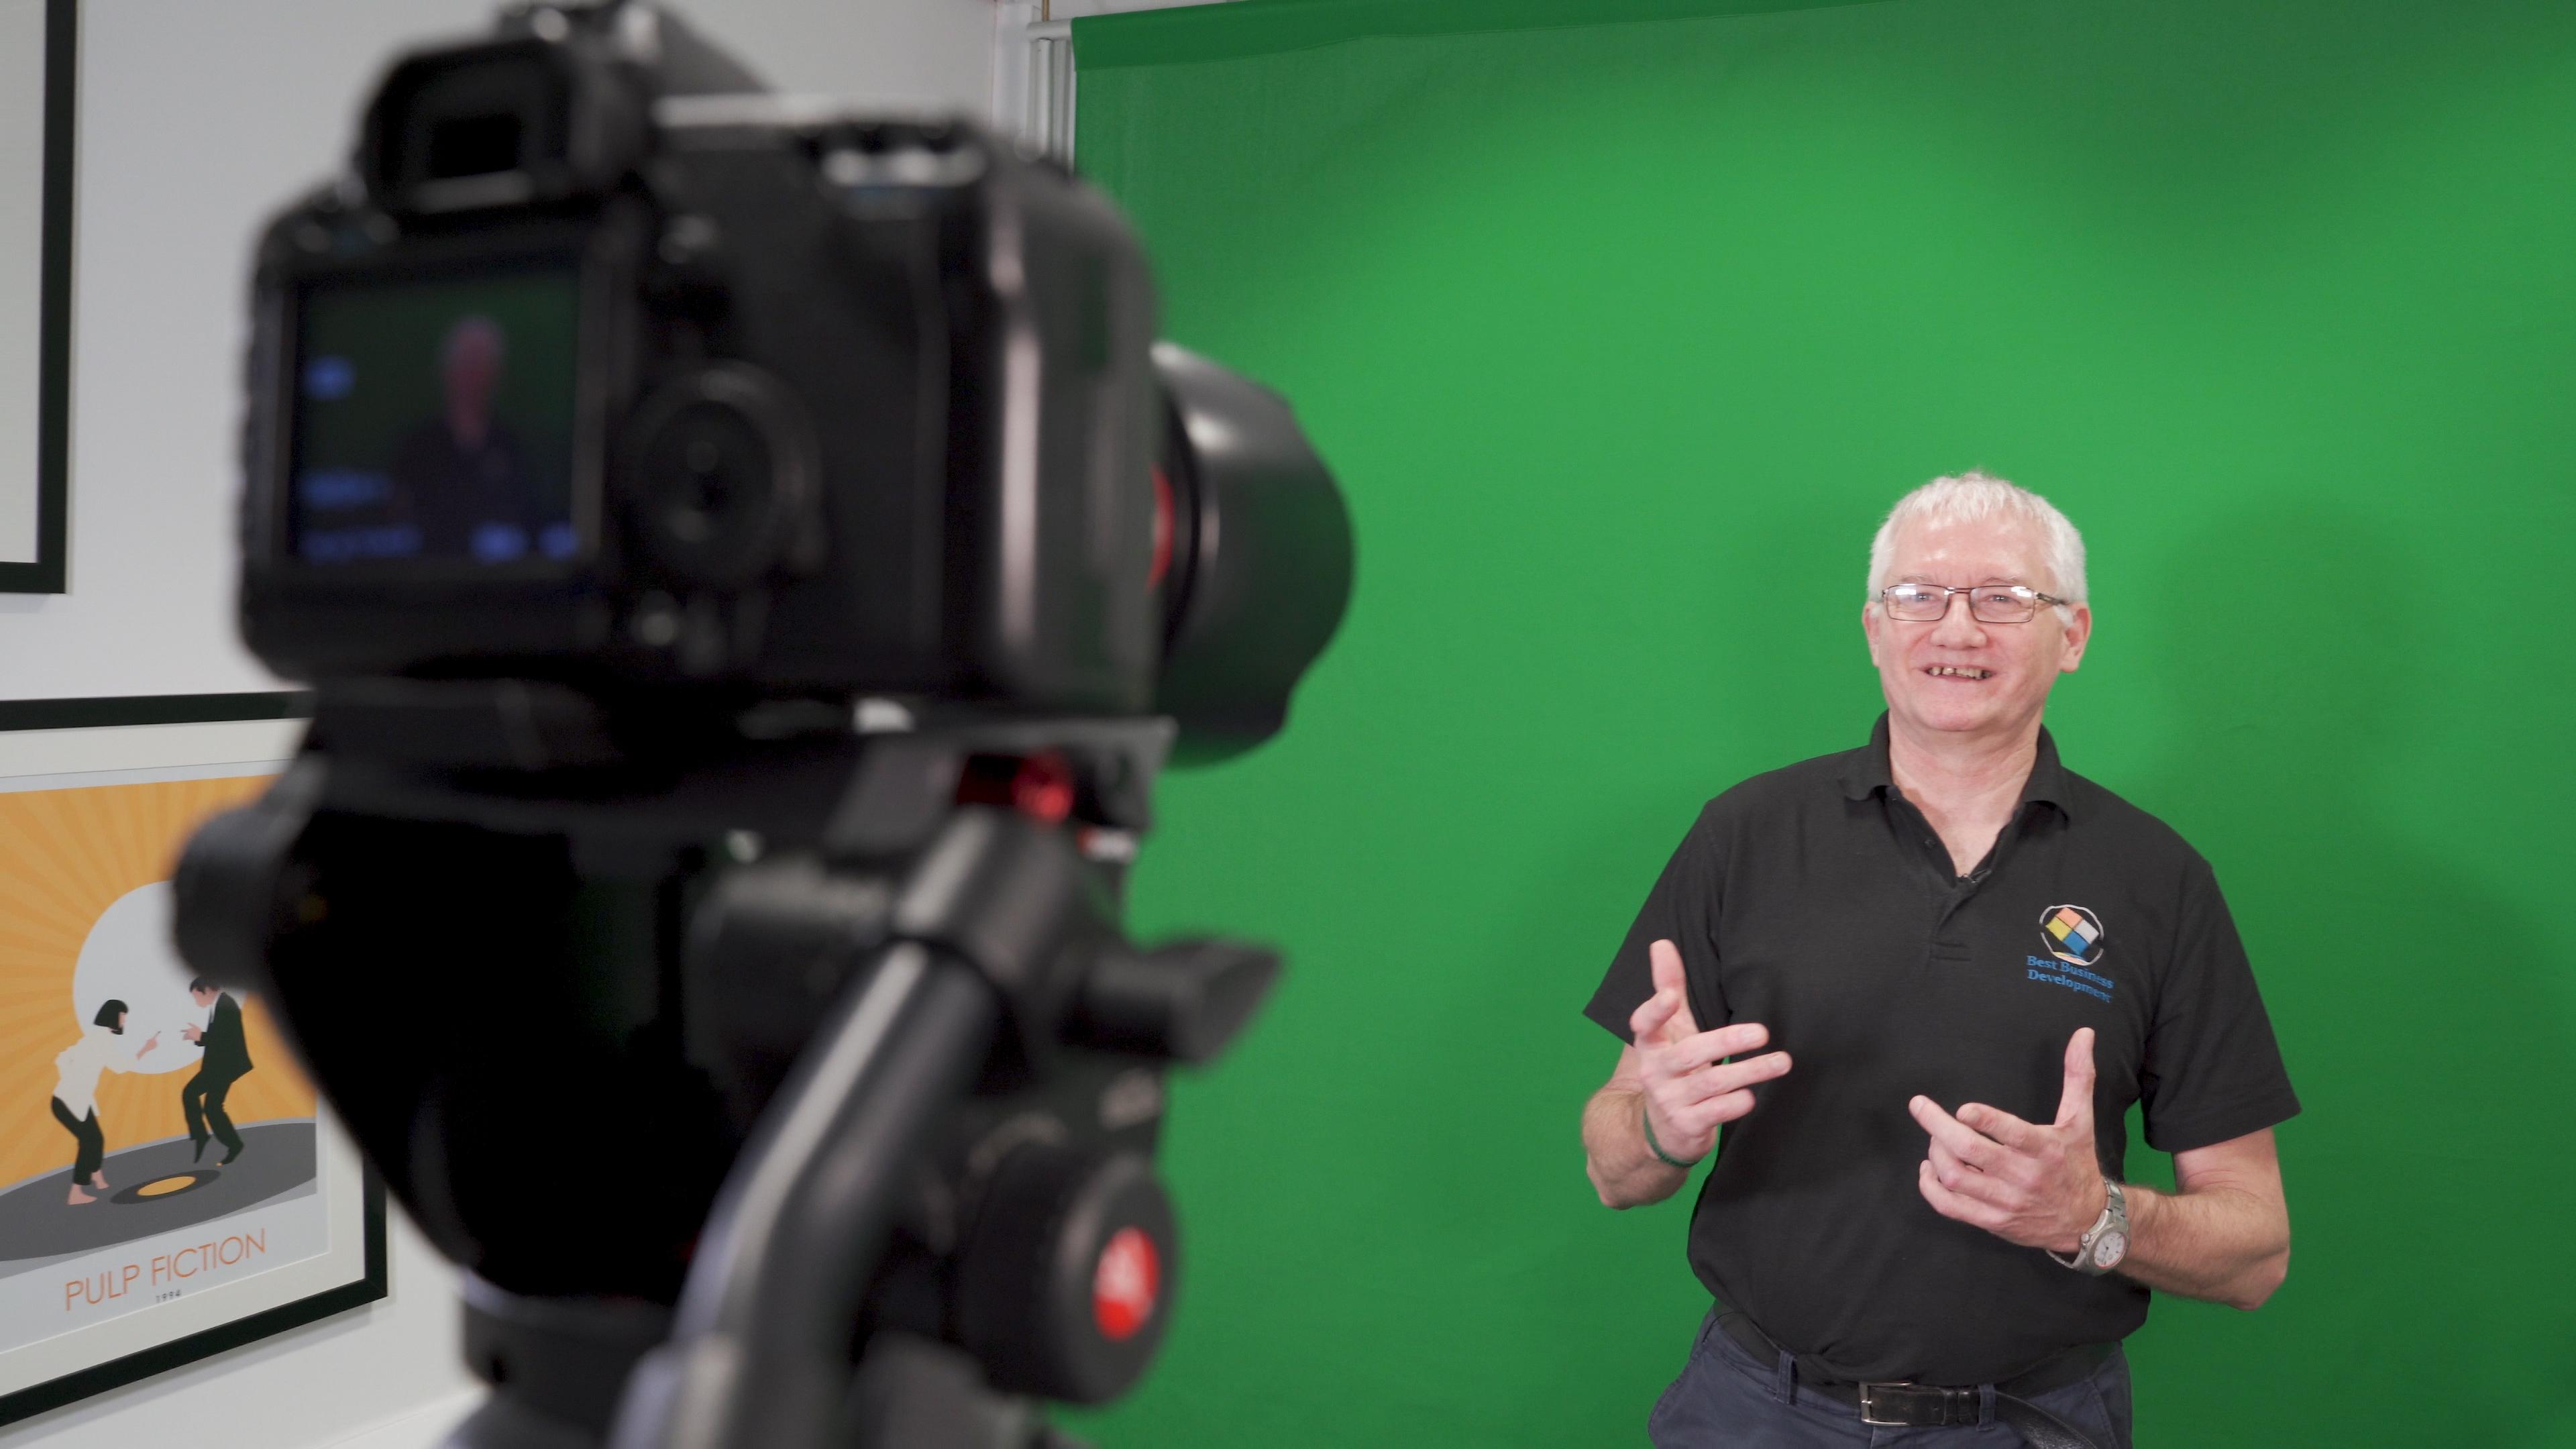 Media Communications Training